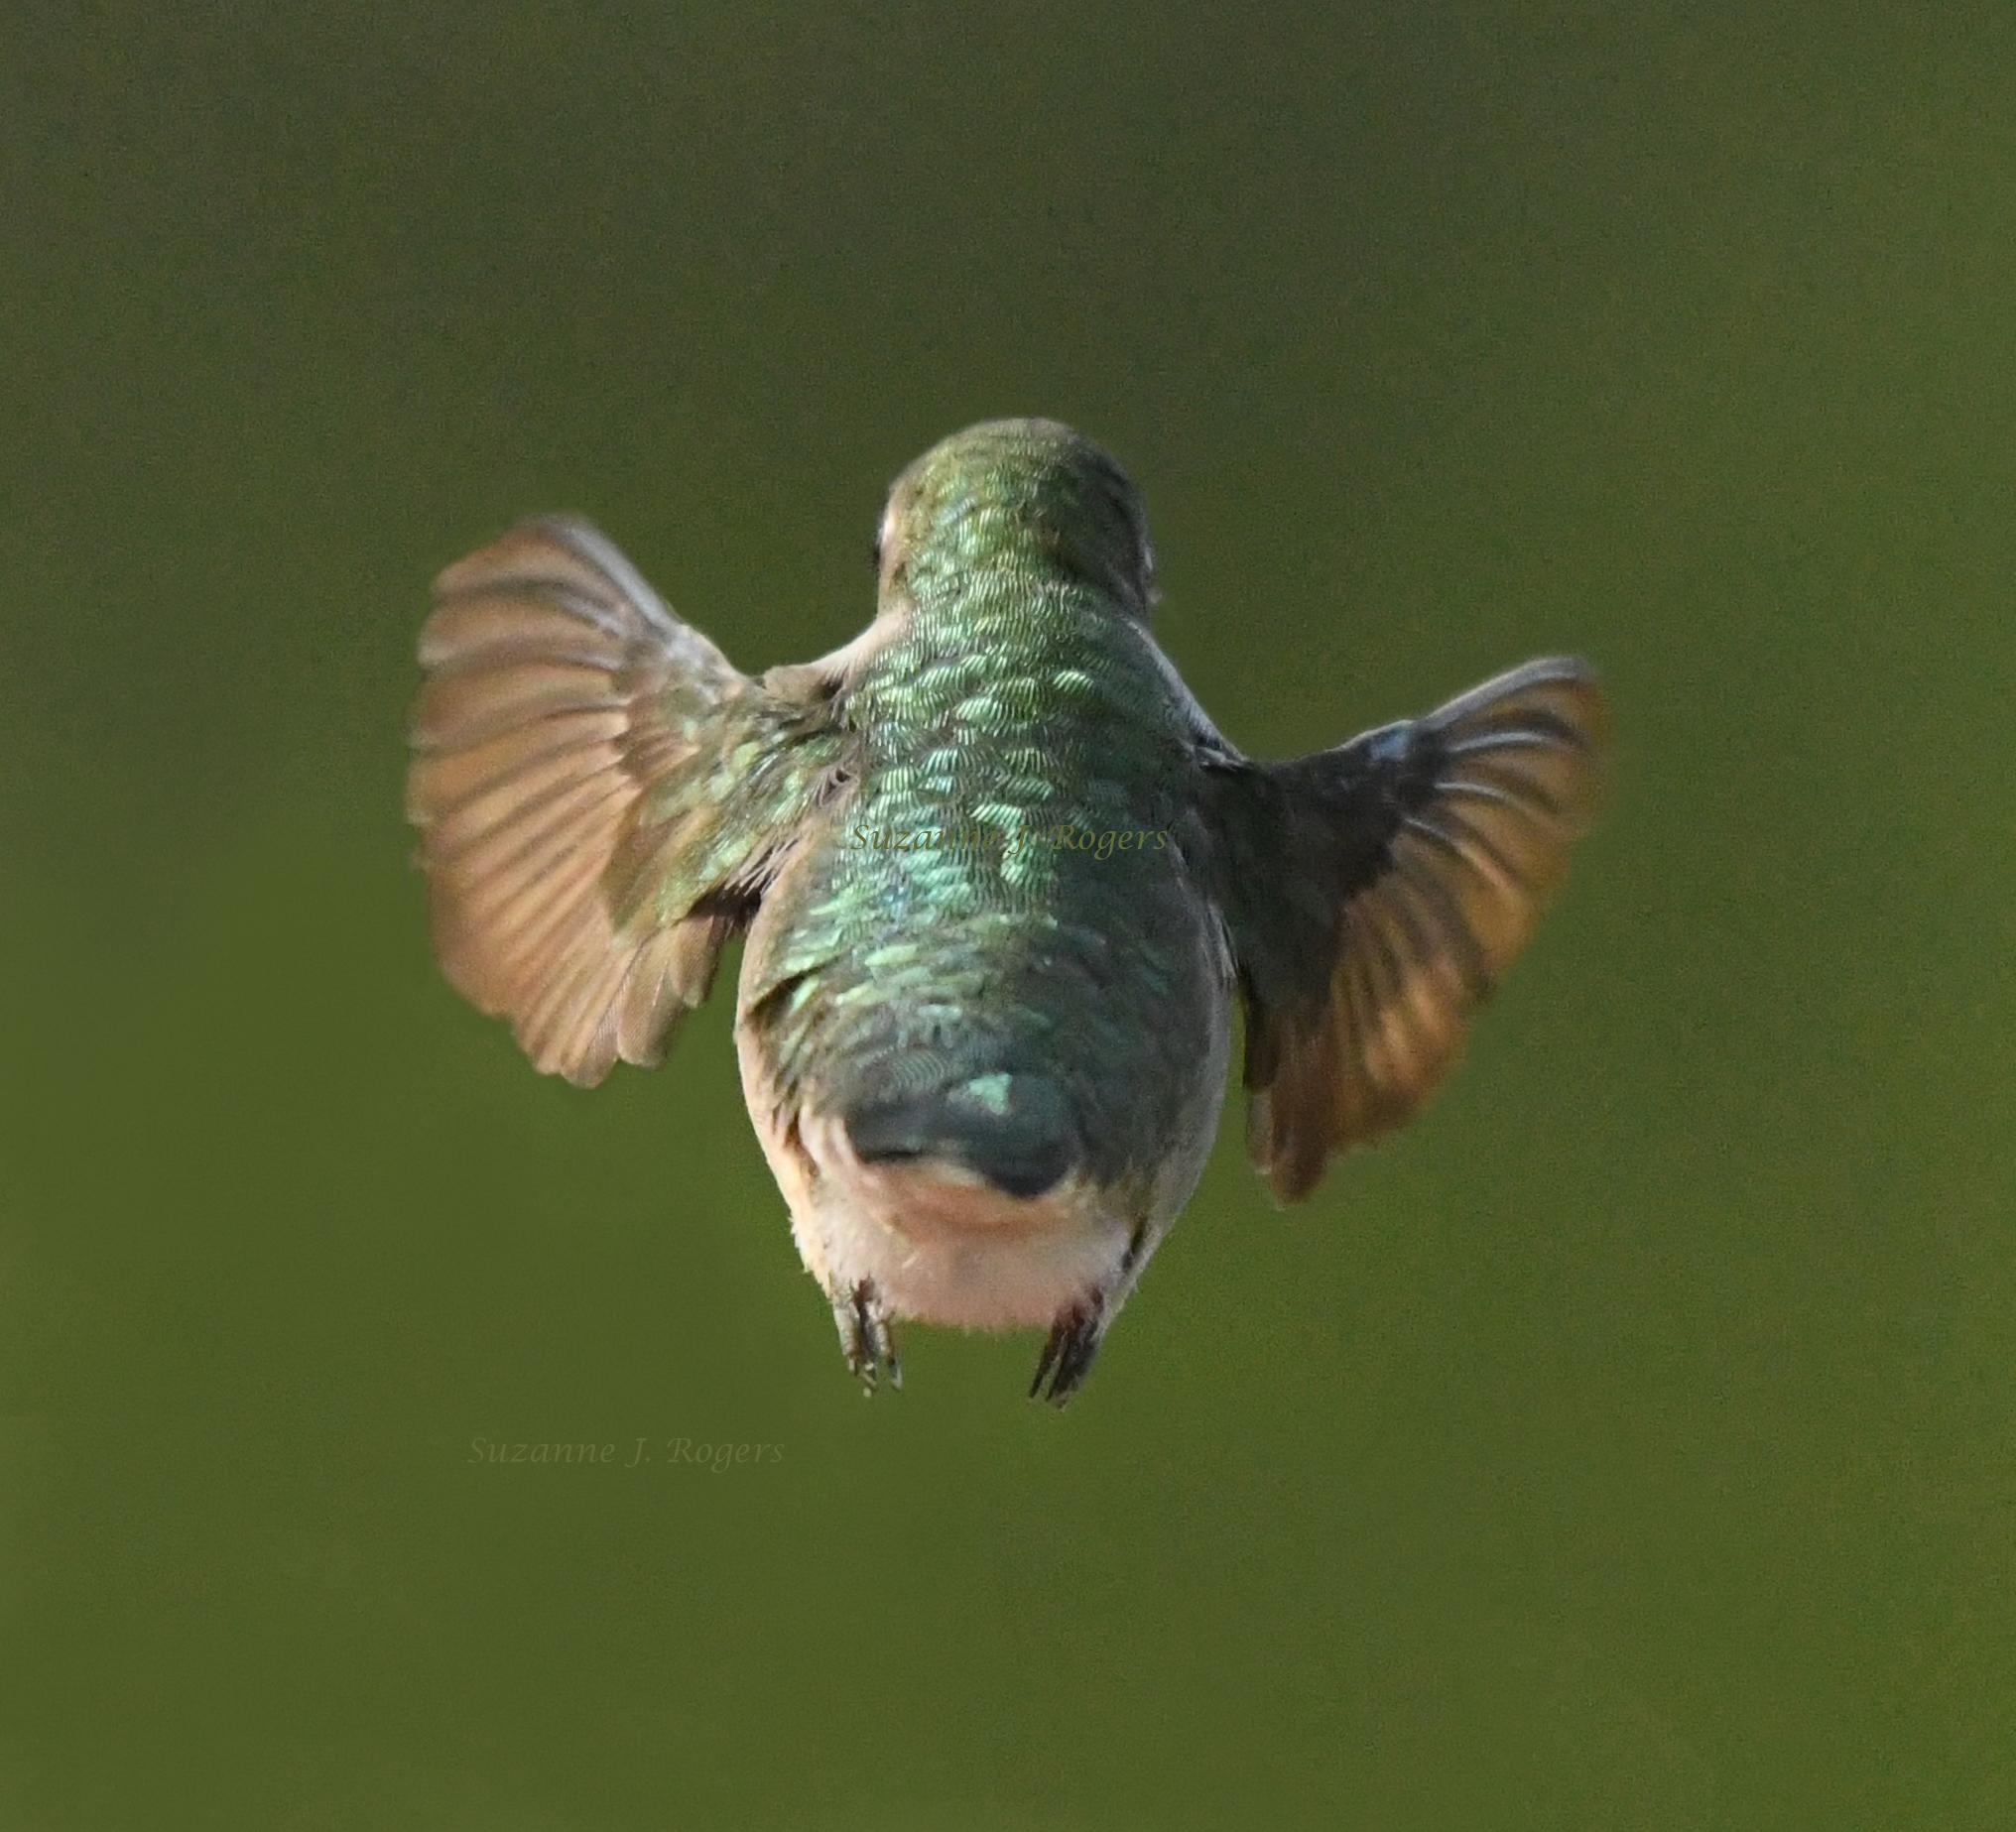 DSC_2153 Hummingbird 2 wms